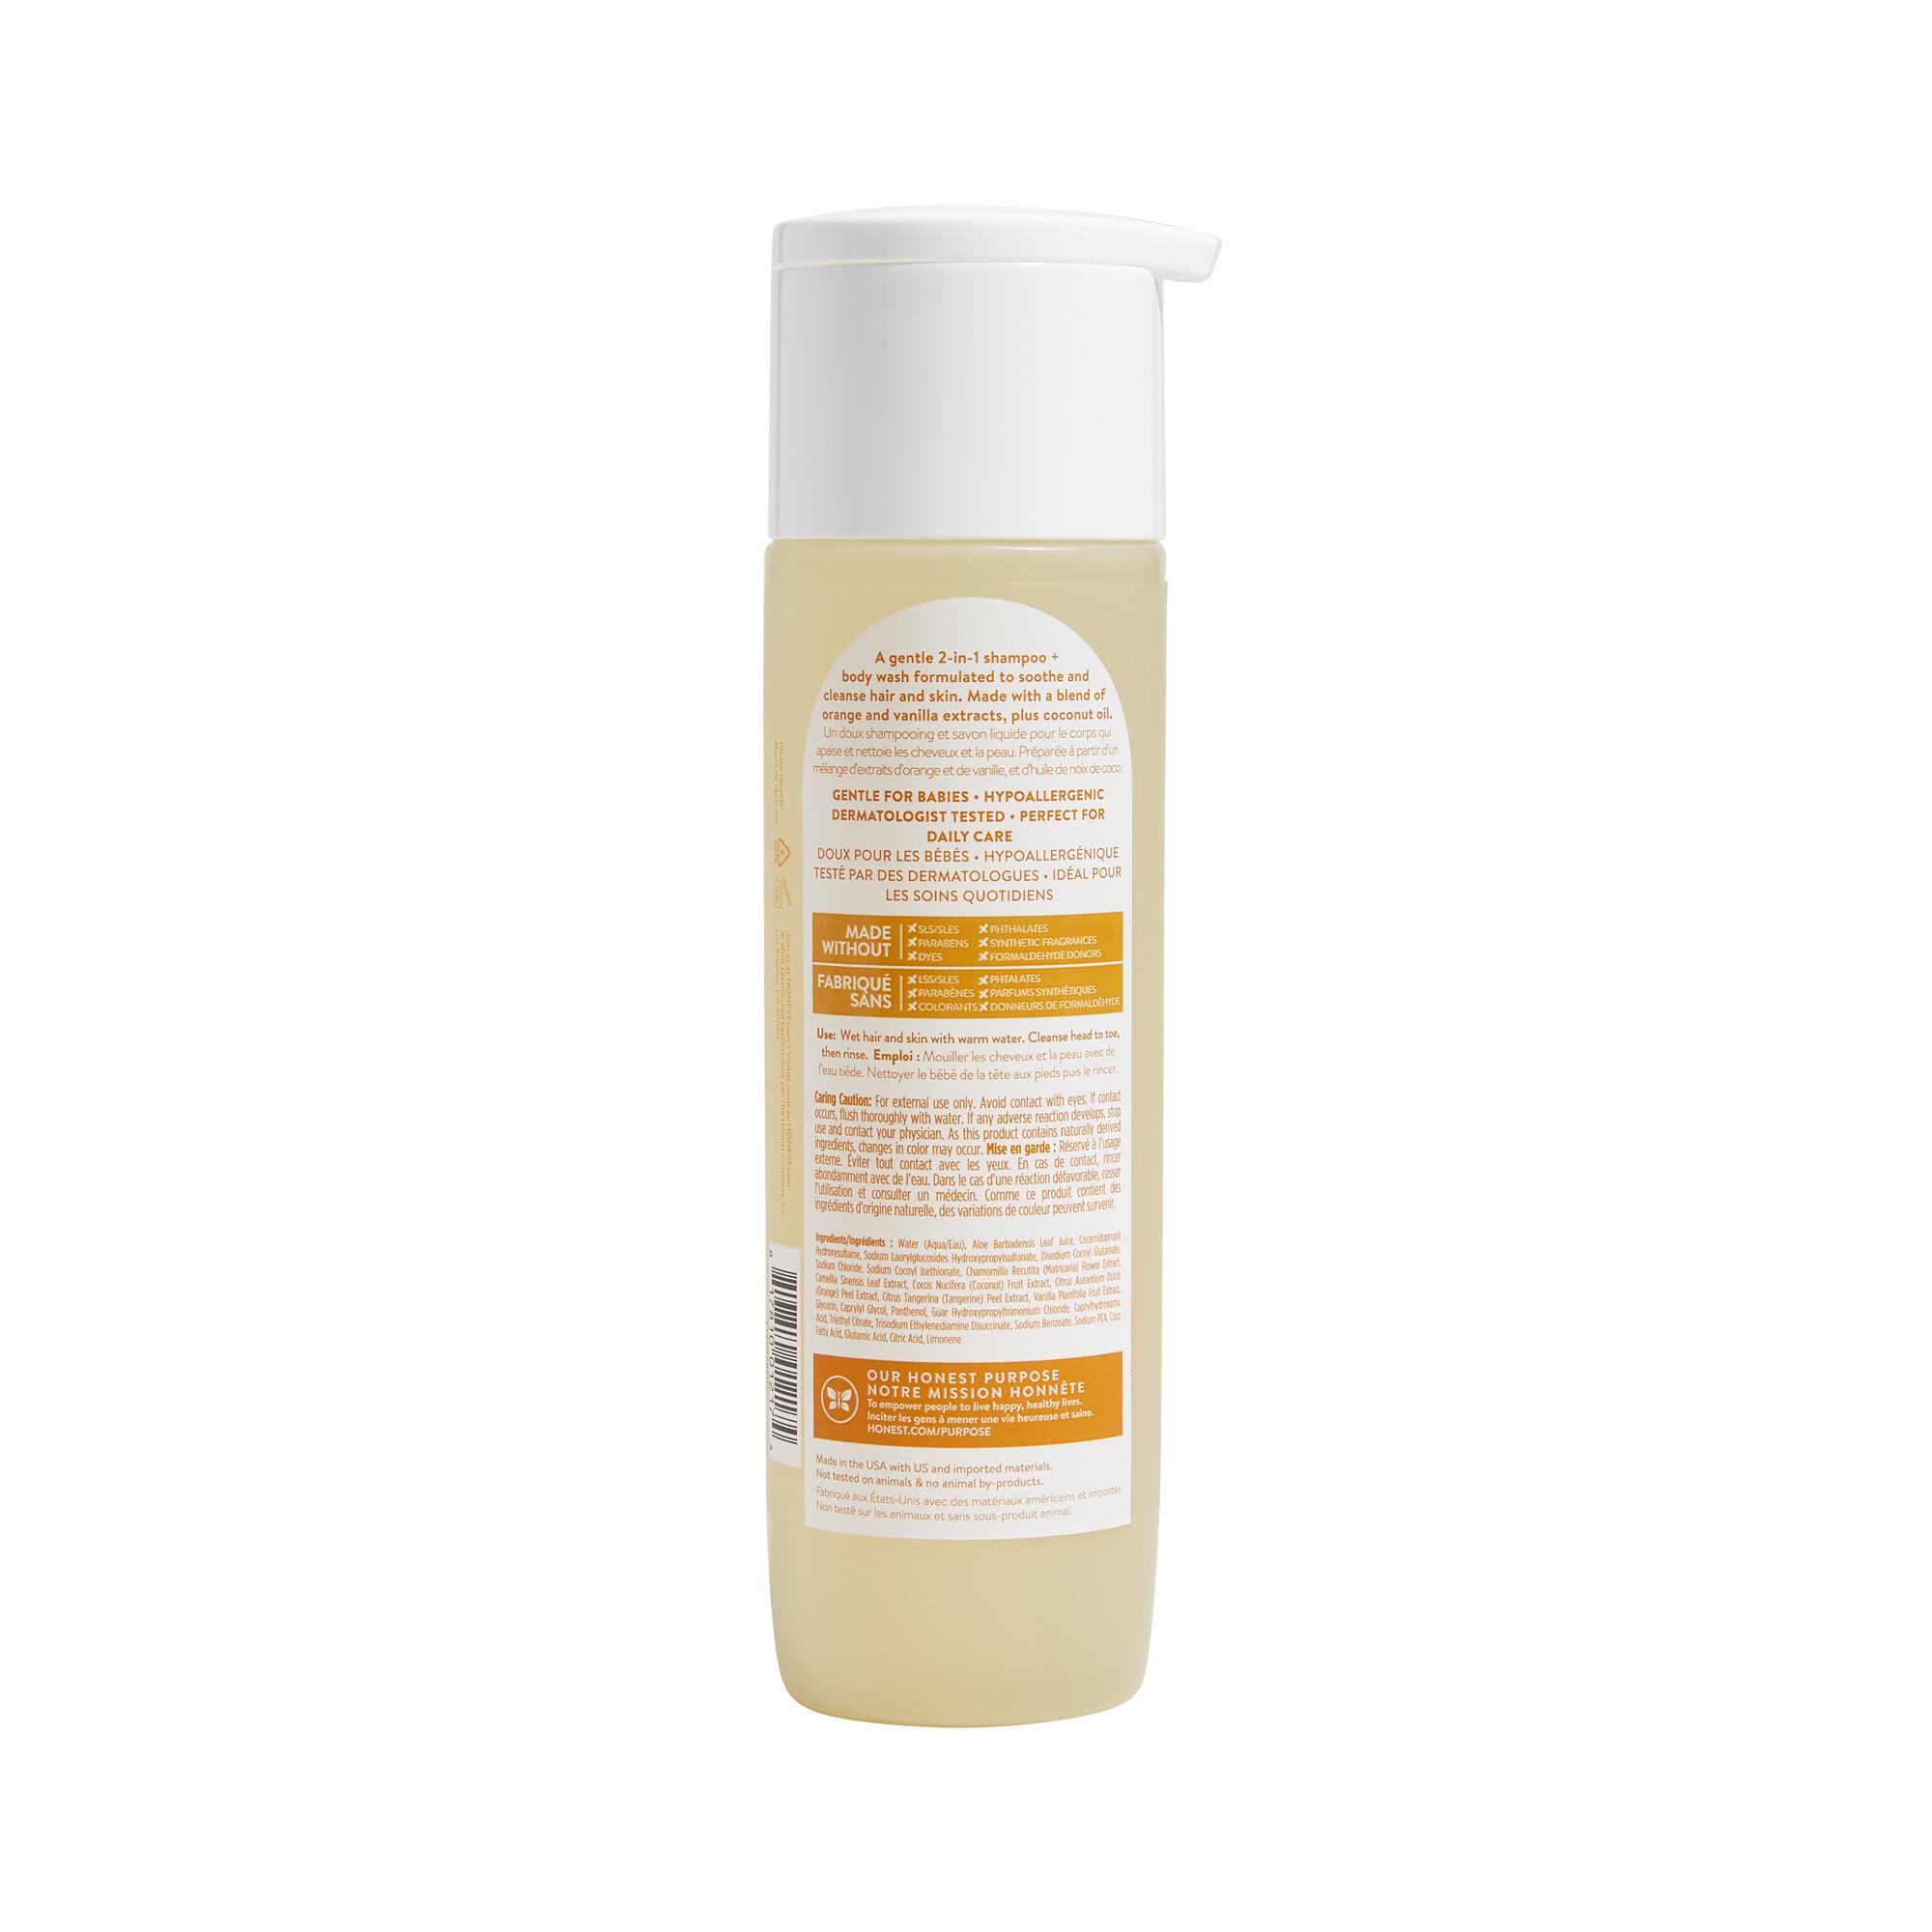 Shampoo + Body Wash - Everyday Gentle